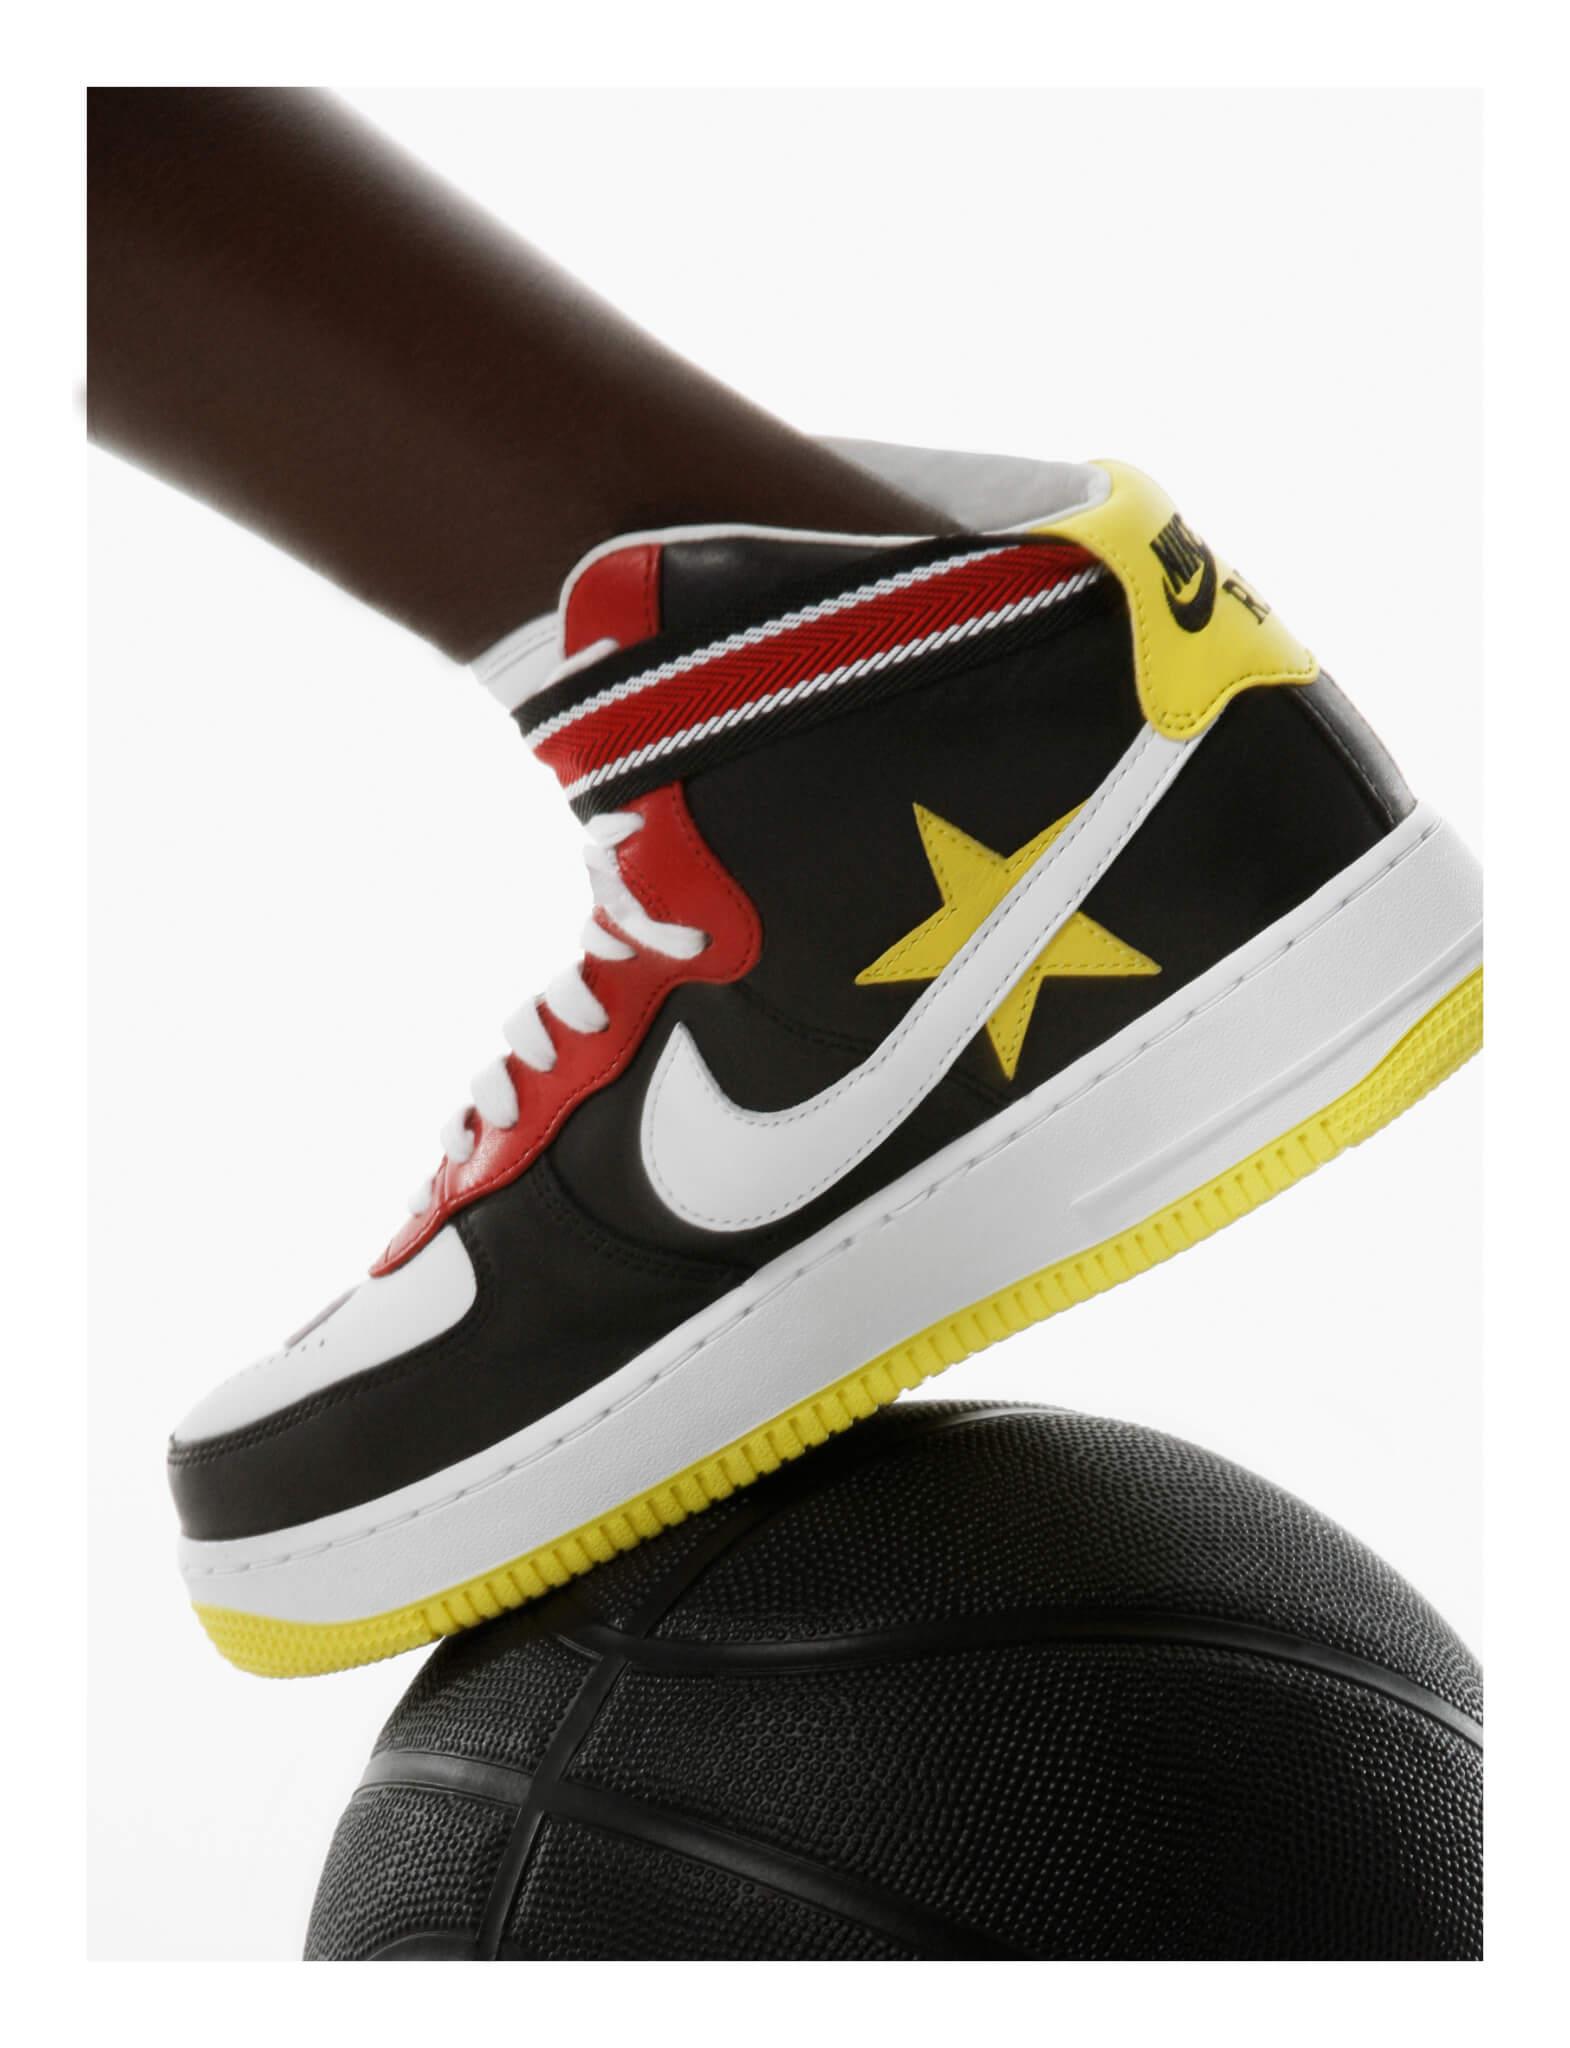 Nike x RT AF-1 HIGH